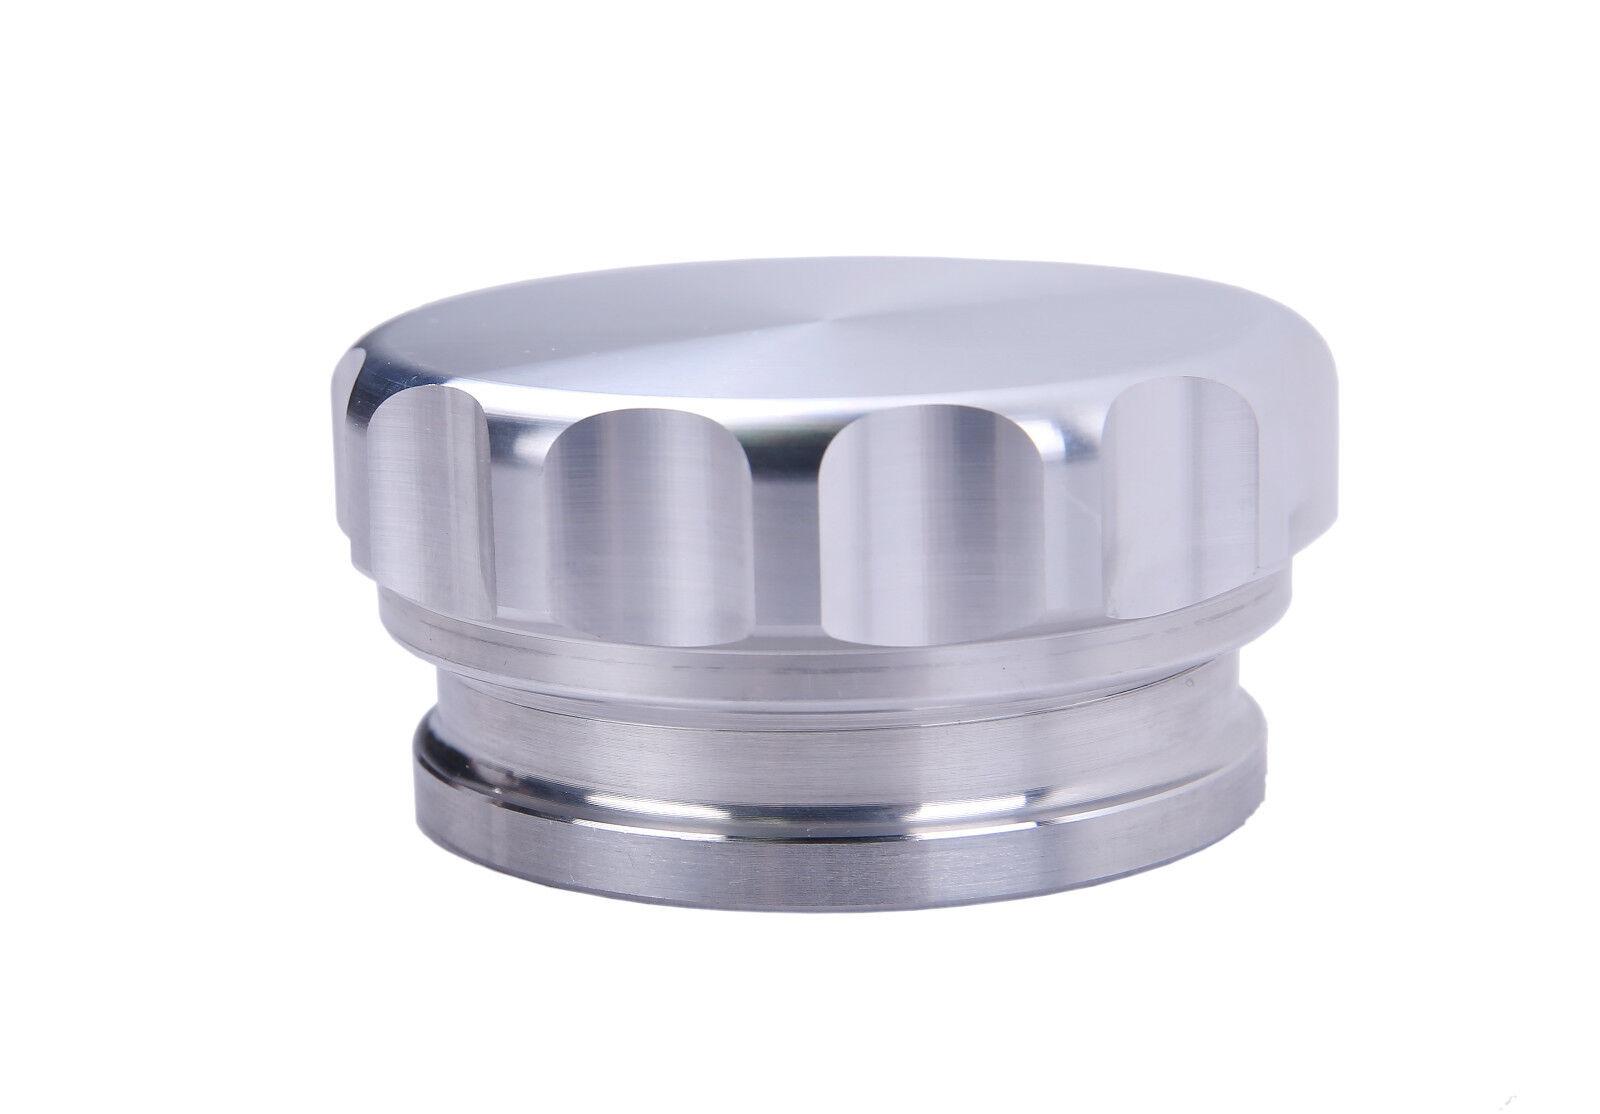 2 Quot Inch 50 8mm Aluminium Alloy Weld On Filler Neck And Cap